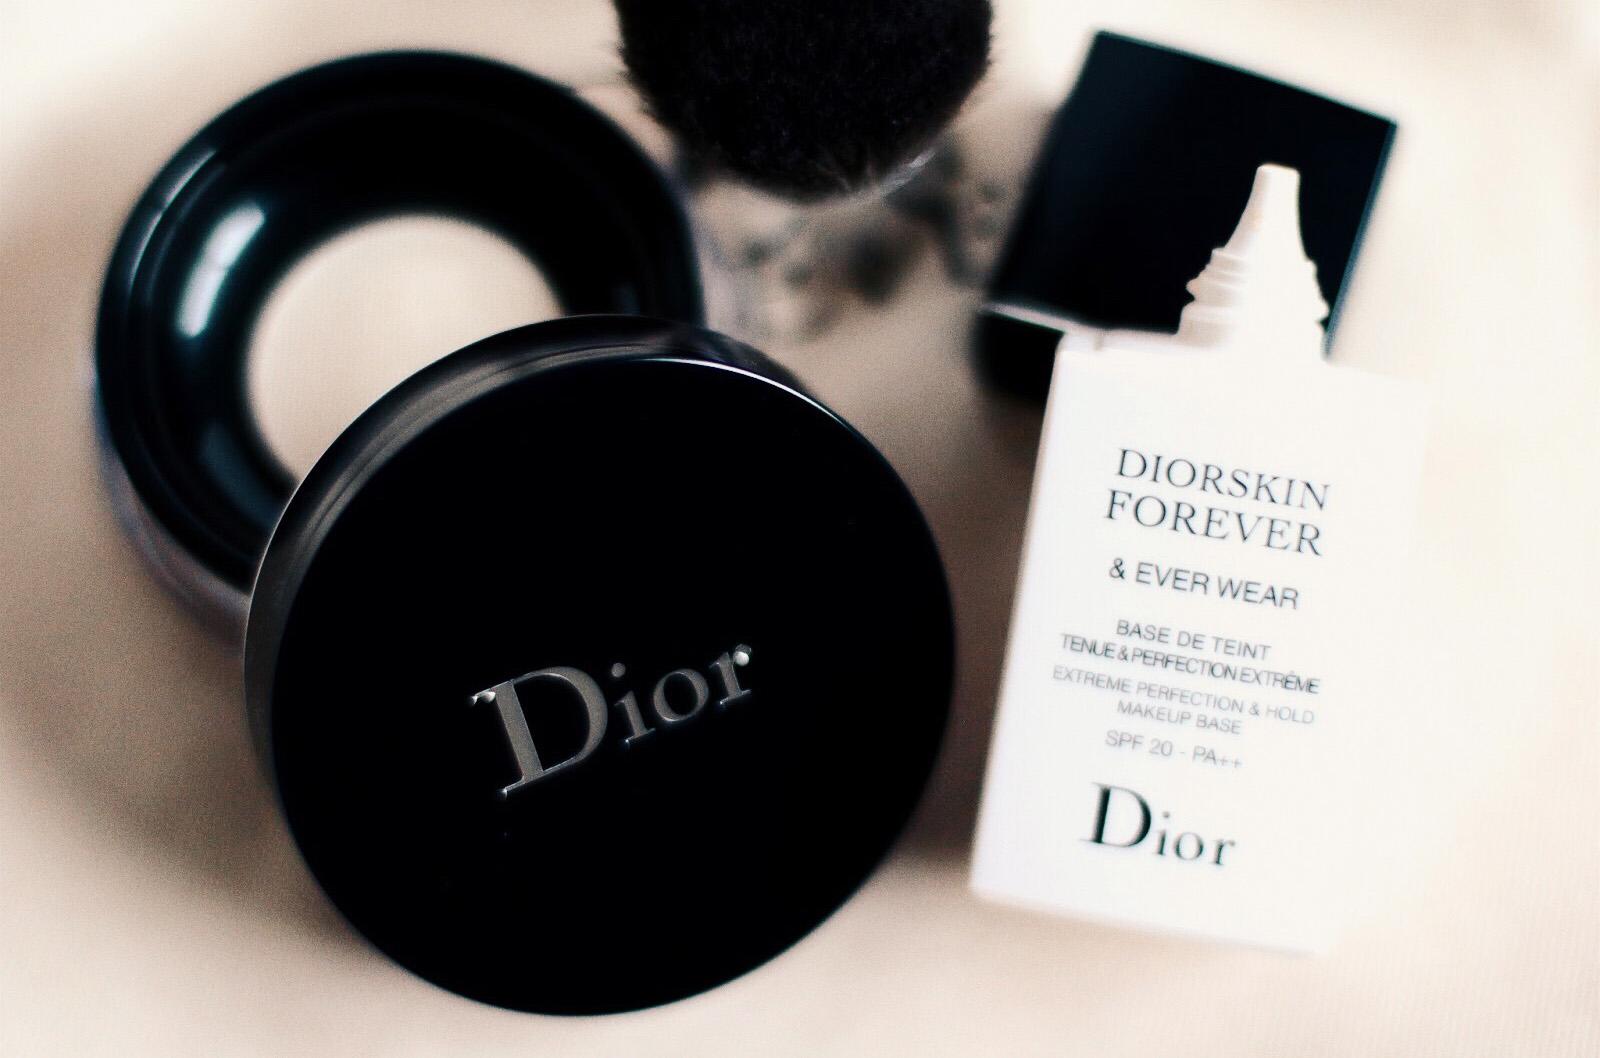 dior diorskin forever base de teint poudre libre ever control avis test